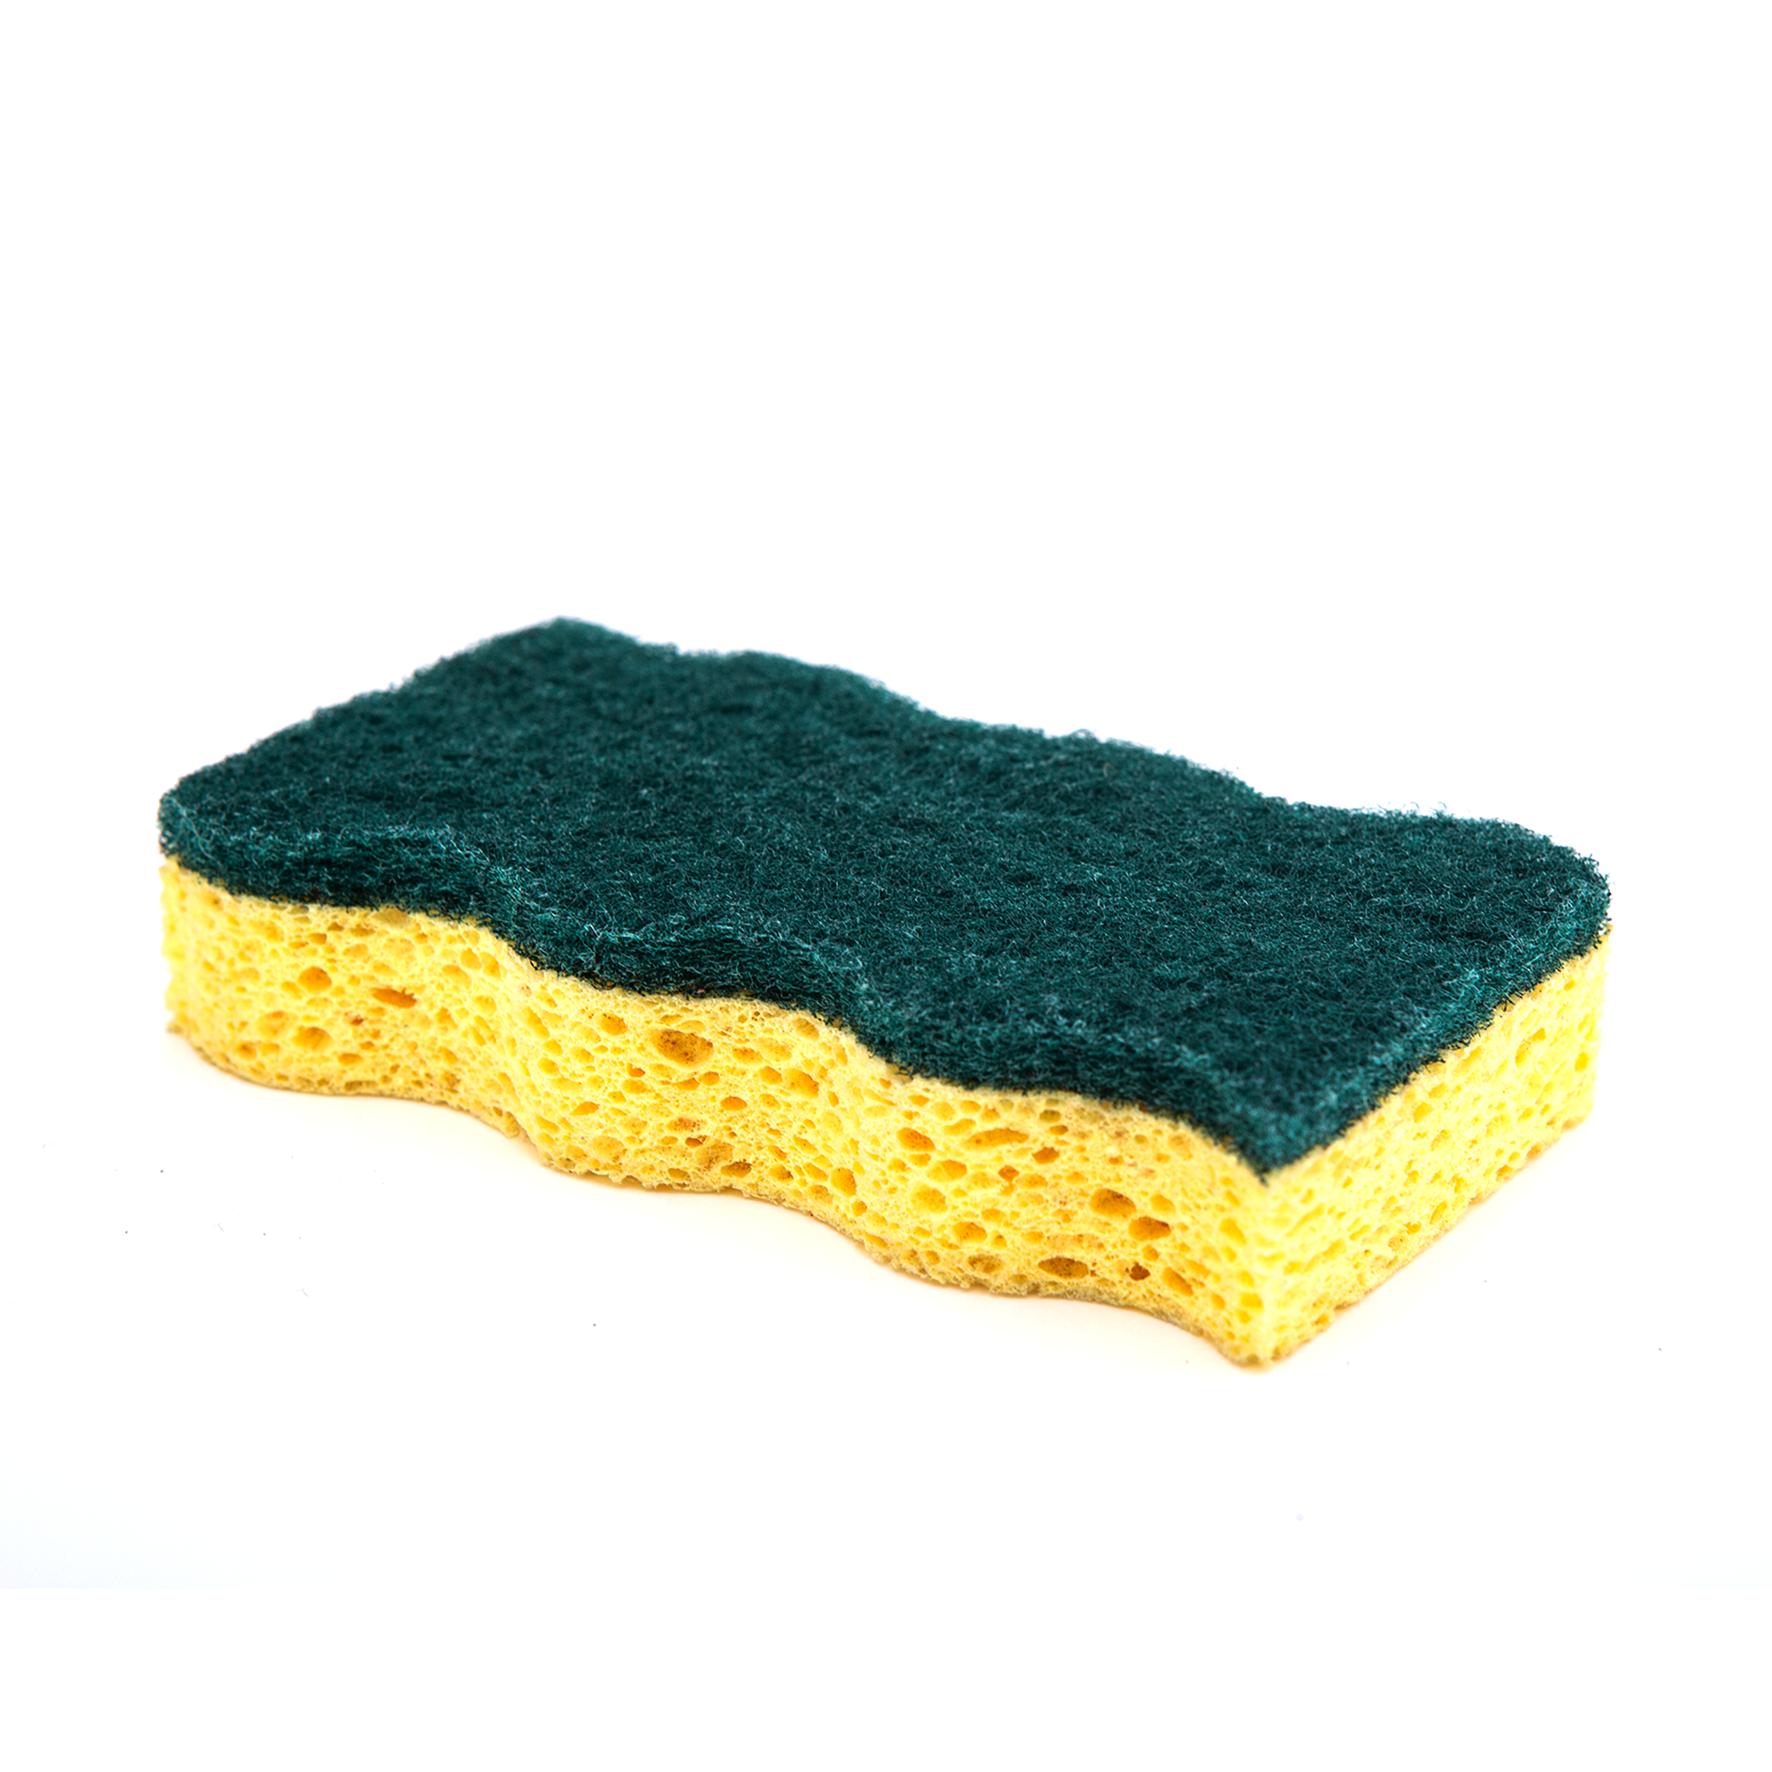 DH-A5-3 带有百洁布的高品质纤维素海绵厨房清洁海绵